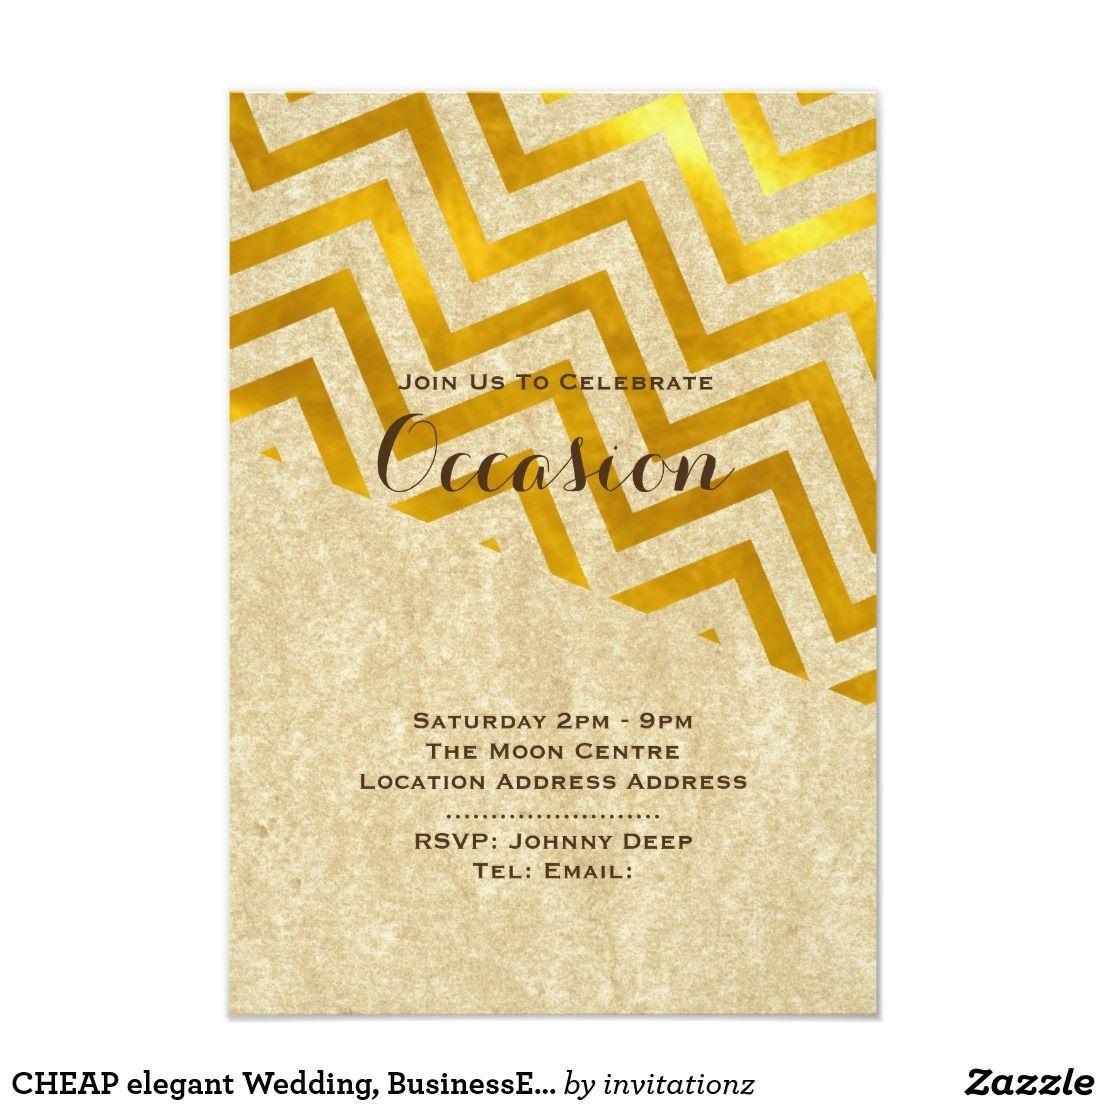 Wedding decorations to make february 2019 CHEAP elegant Wedding BusinessEvent Invites Gold  Trending Wedding